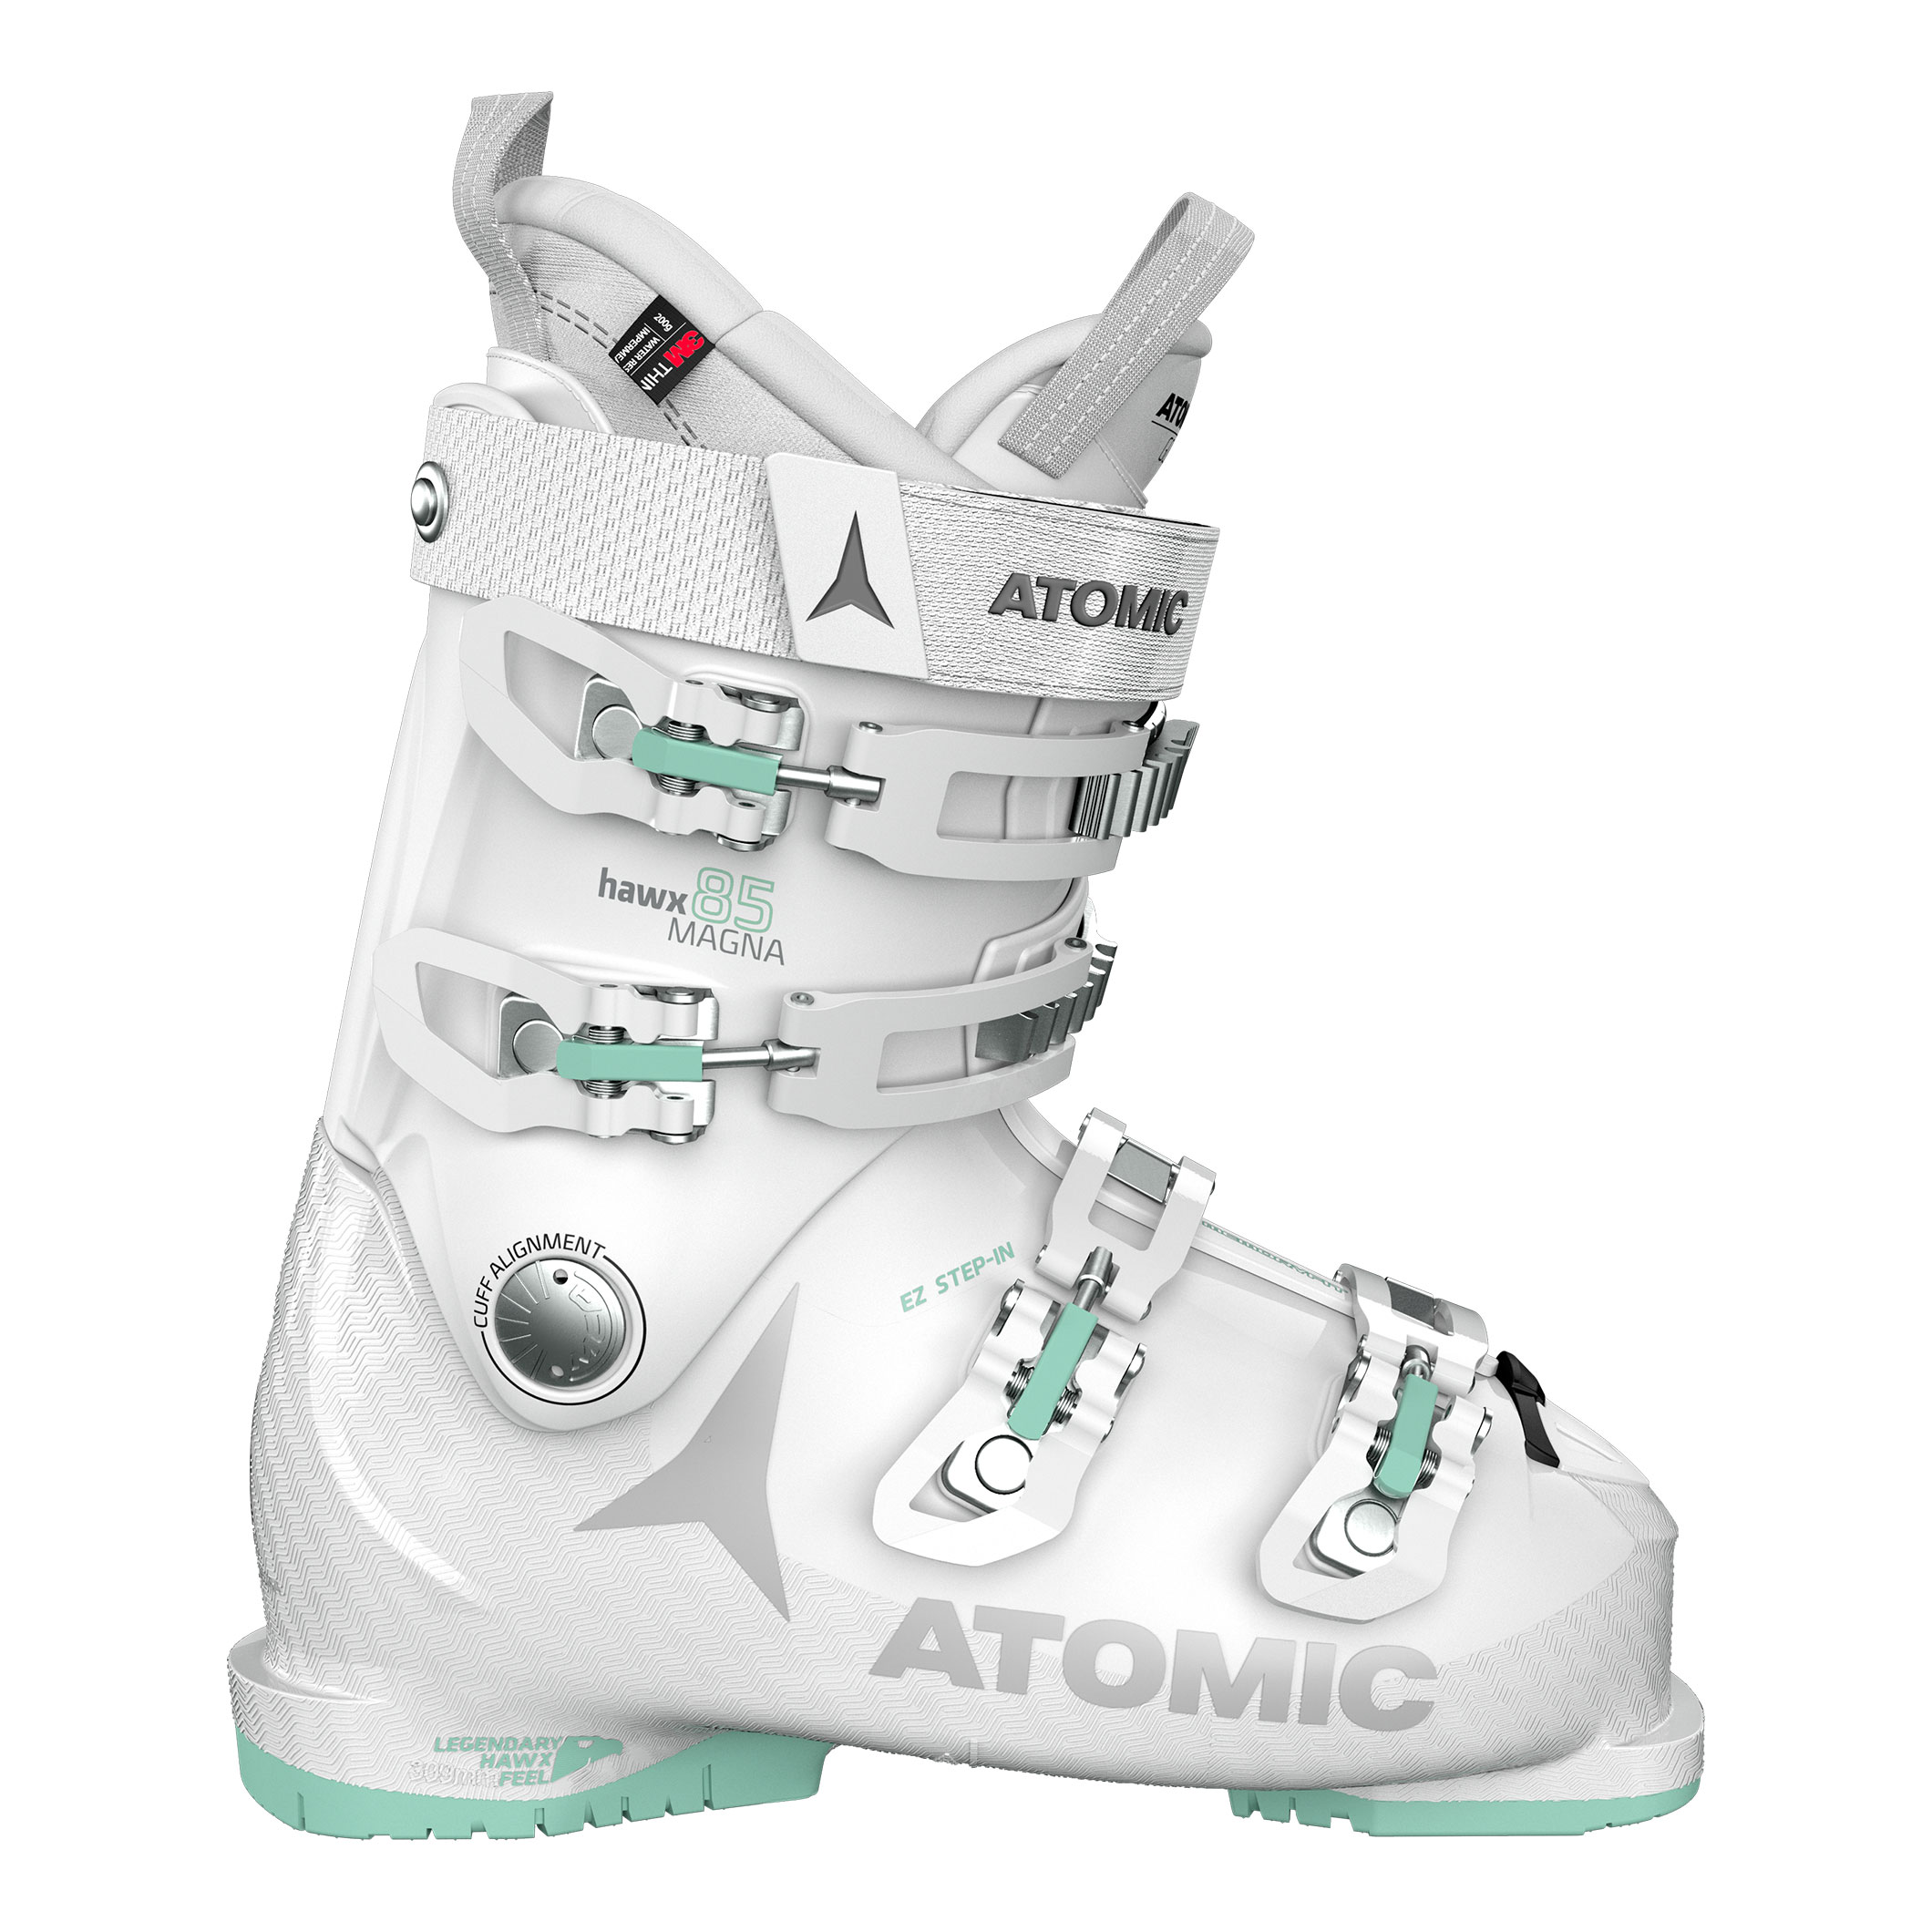 Atomic Hawx Magna 85 W 2022